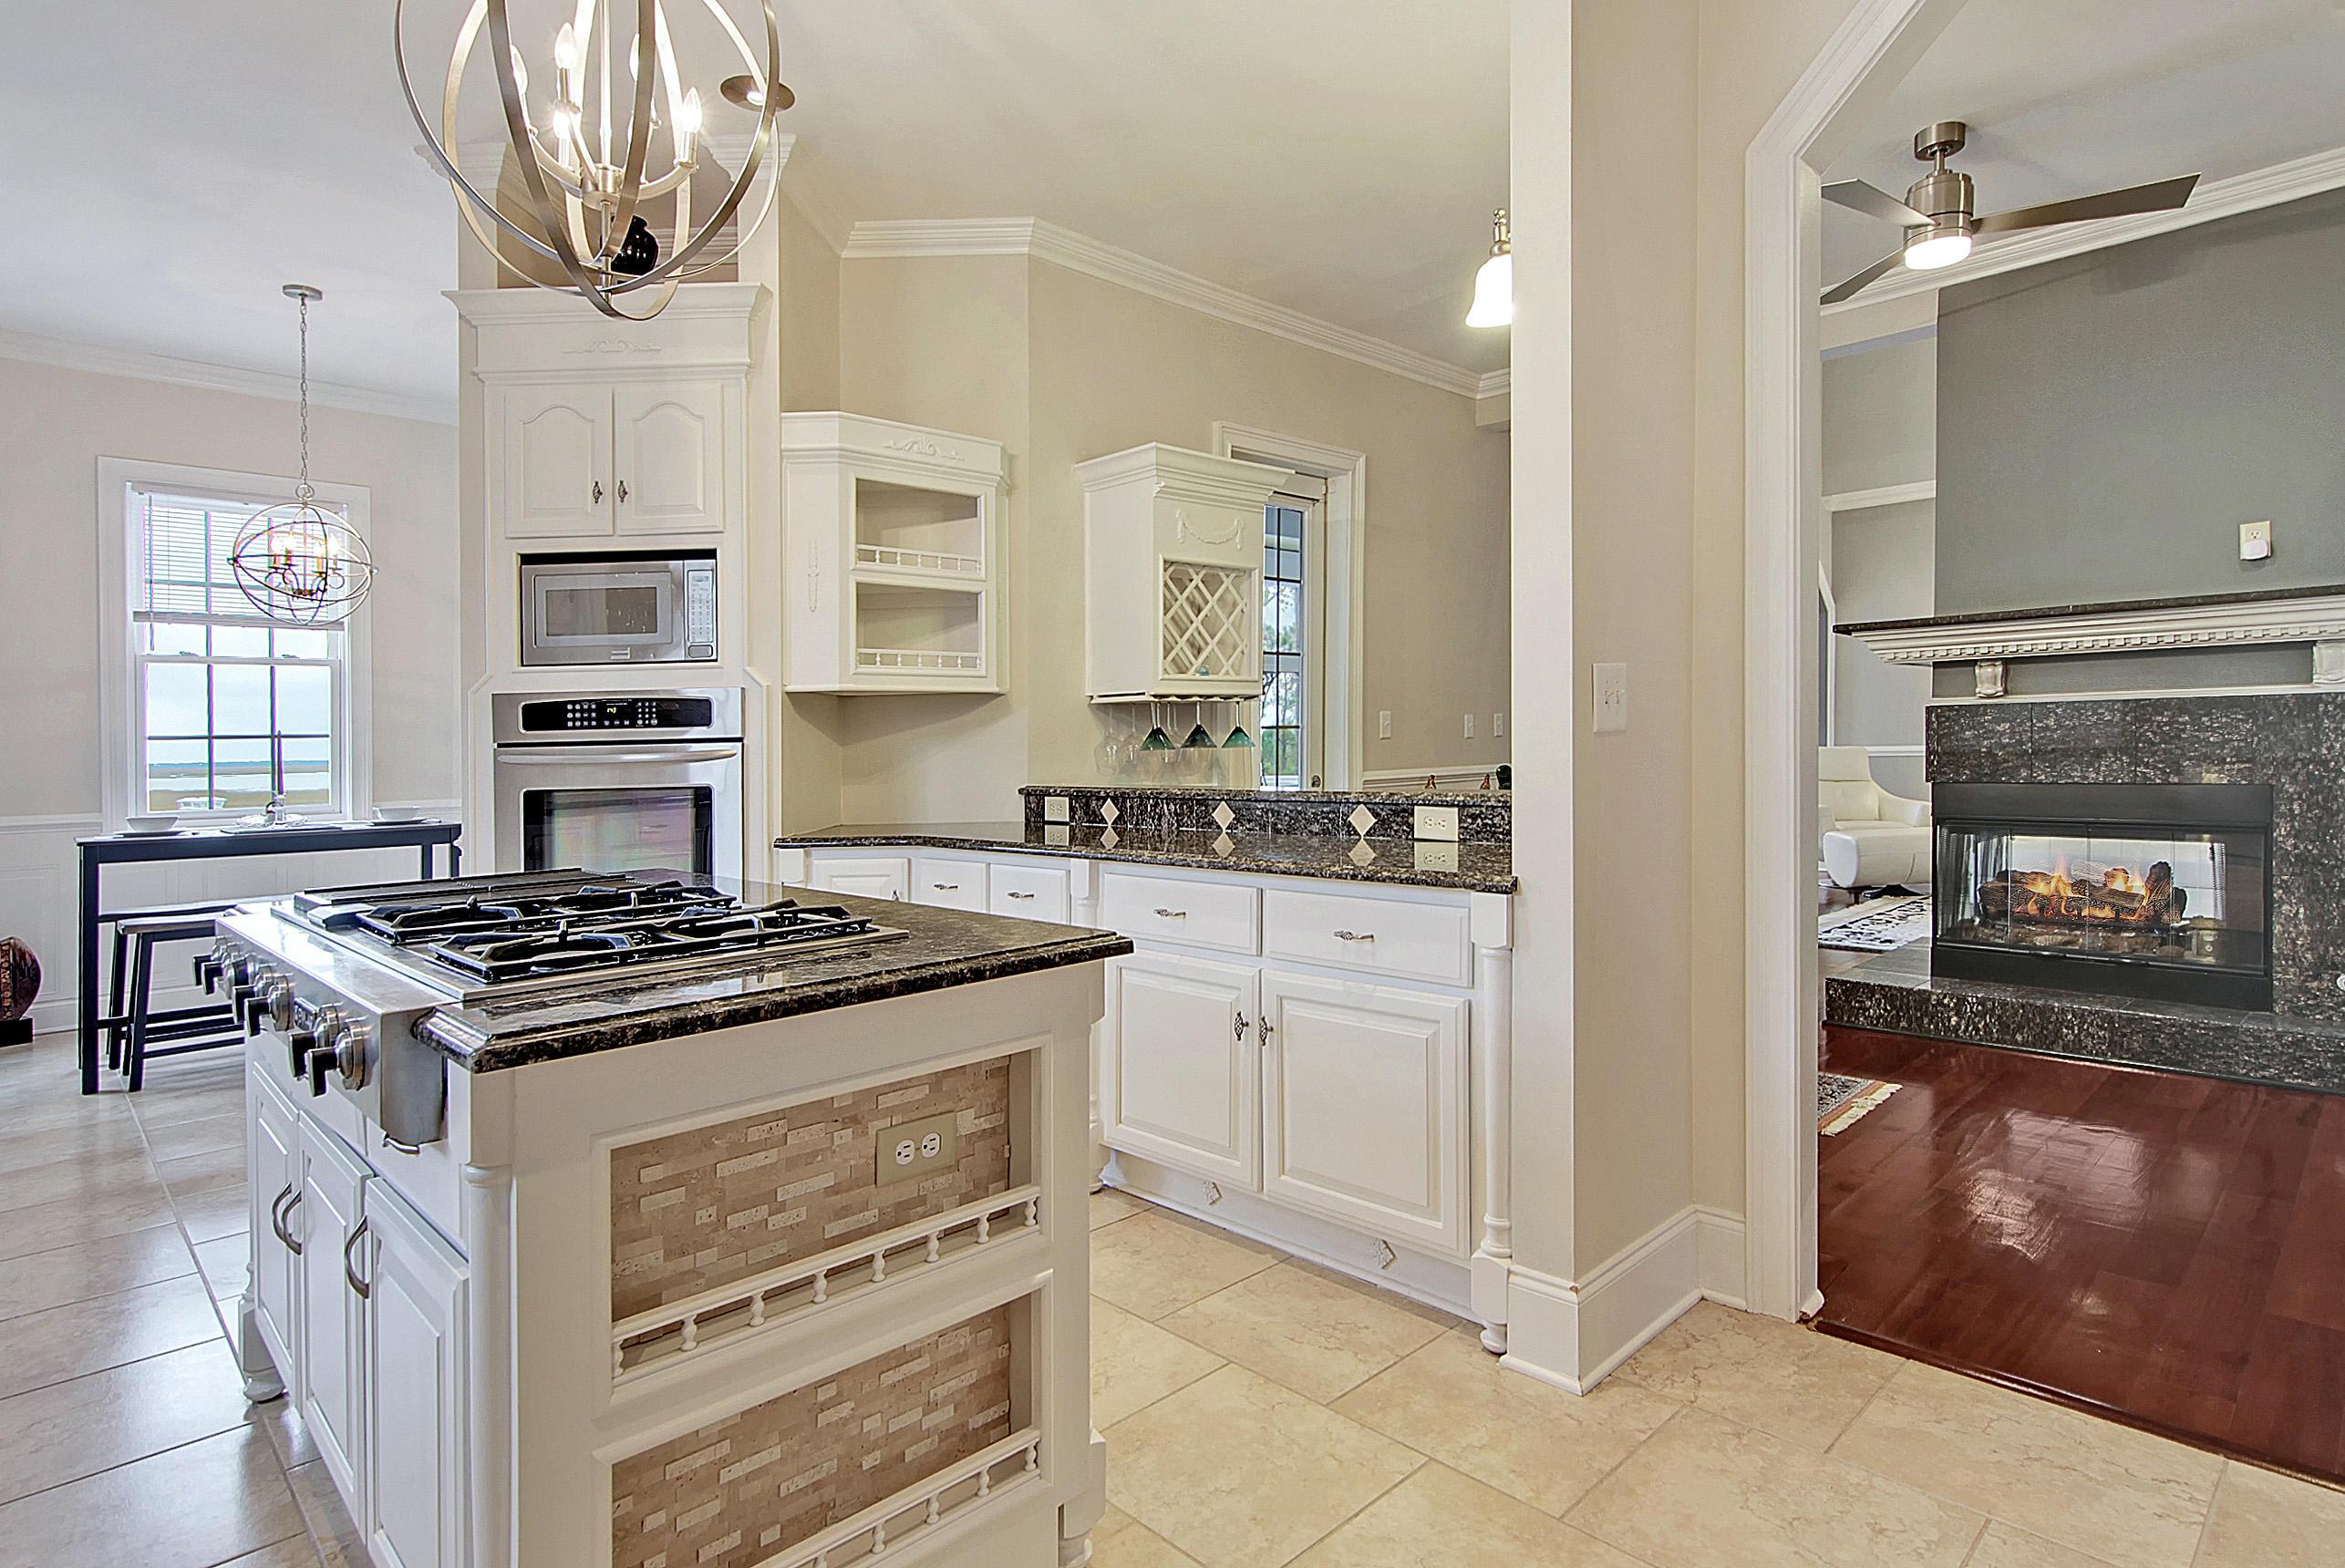 Hamlin Beach Homes For Sale - 2797 Hamlin Beach, Mount Pleasant, SC - 16